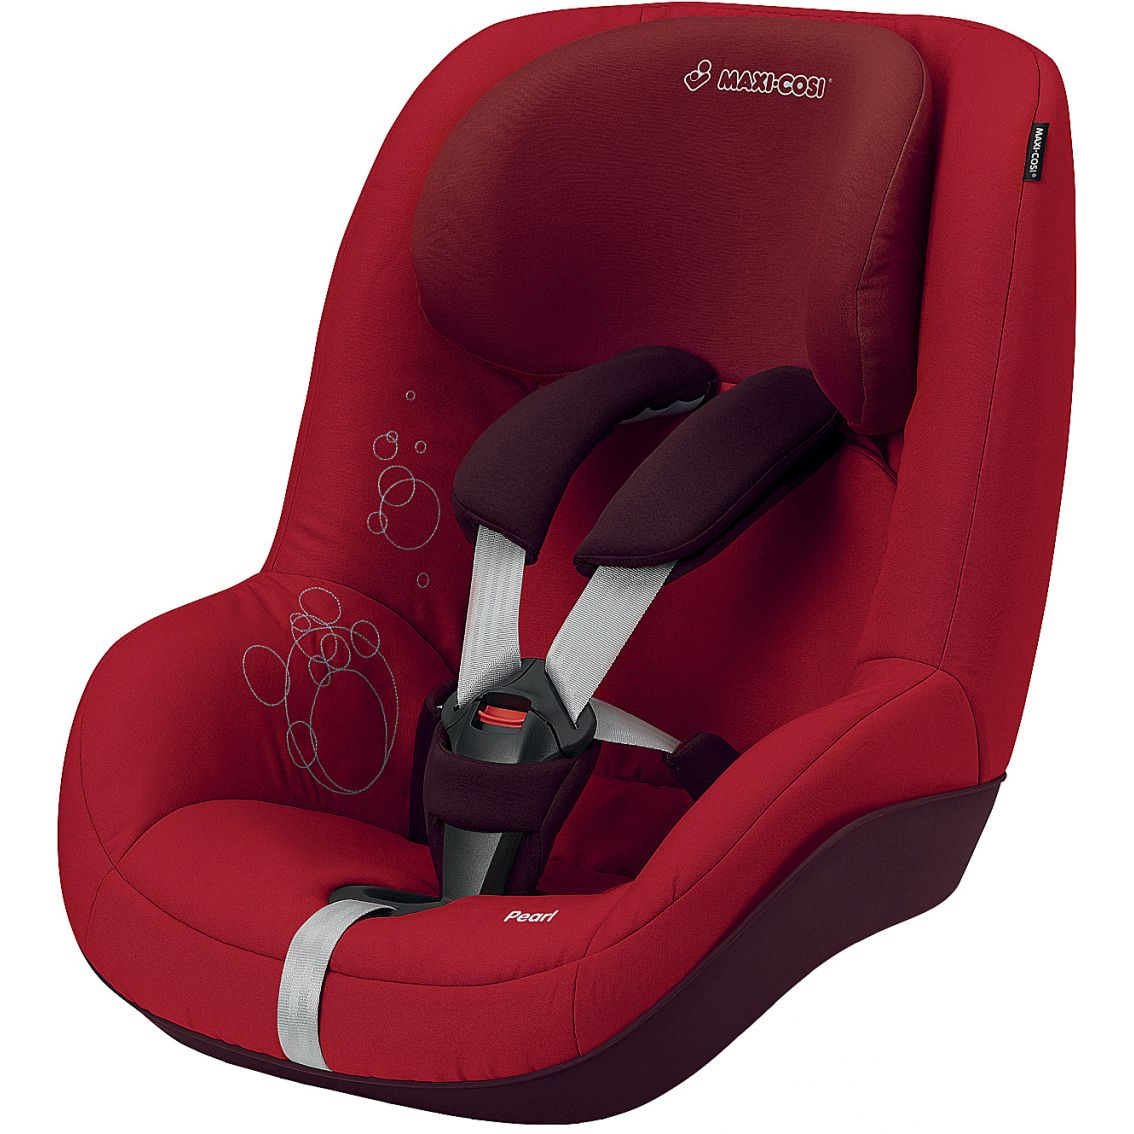 maxi cosi pearl car seat 2013. Black Bedroom Furniture Sets. Home Design Ideas